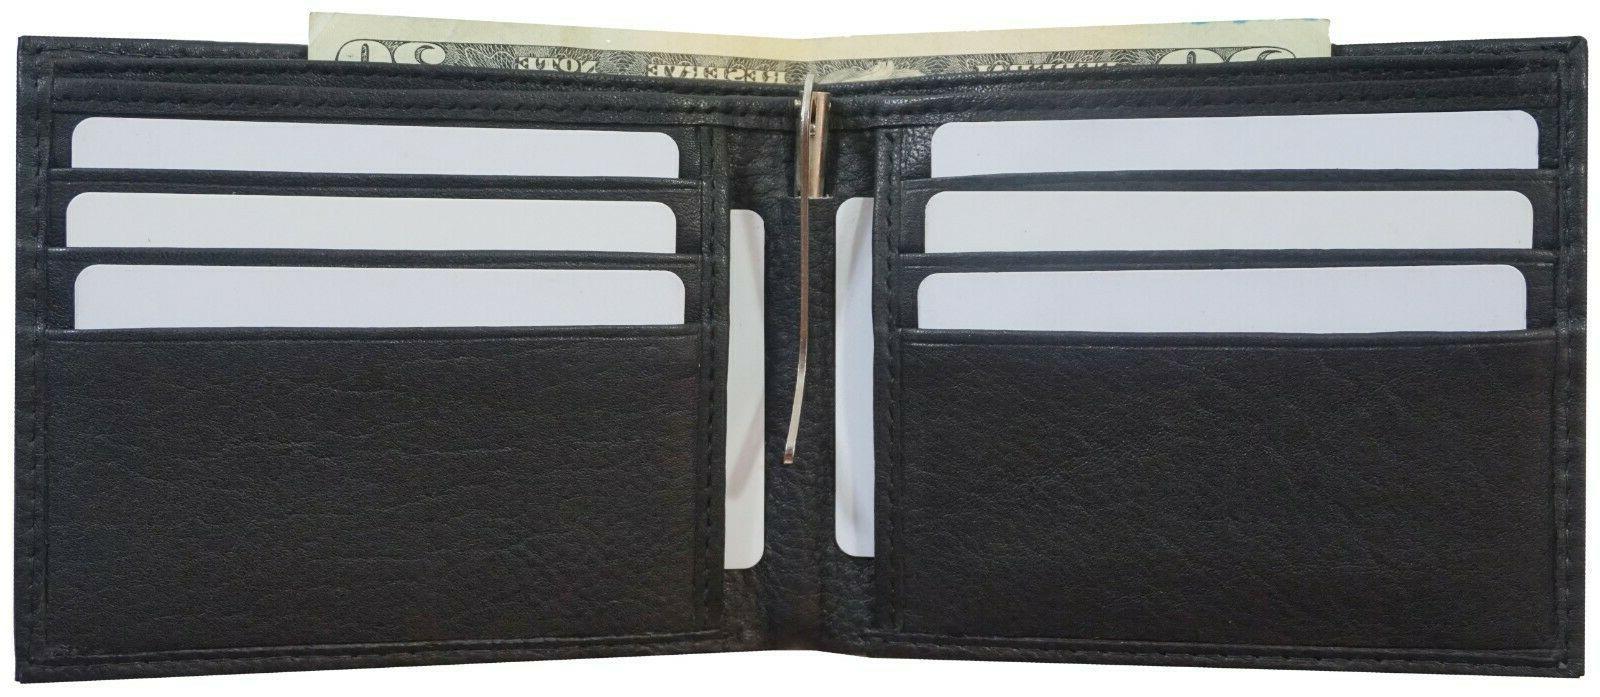 Mens Money Clip Wallet Slim Front